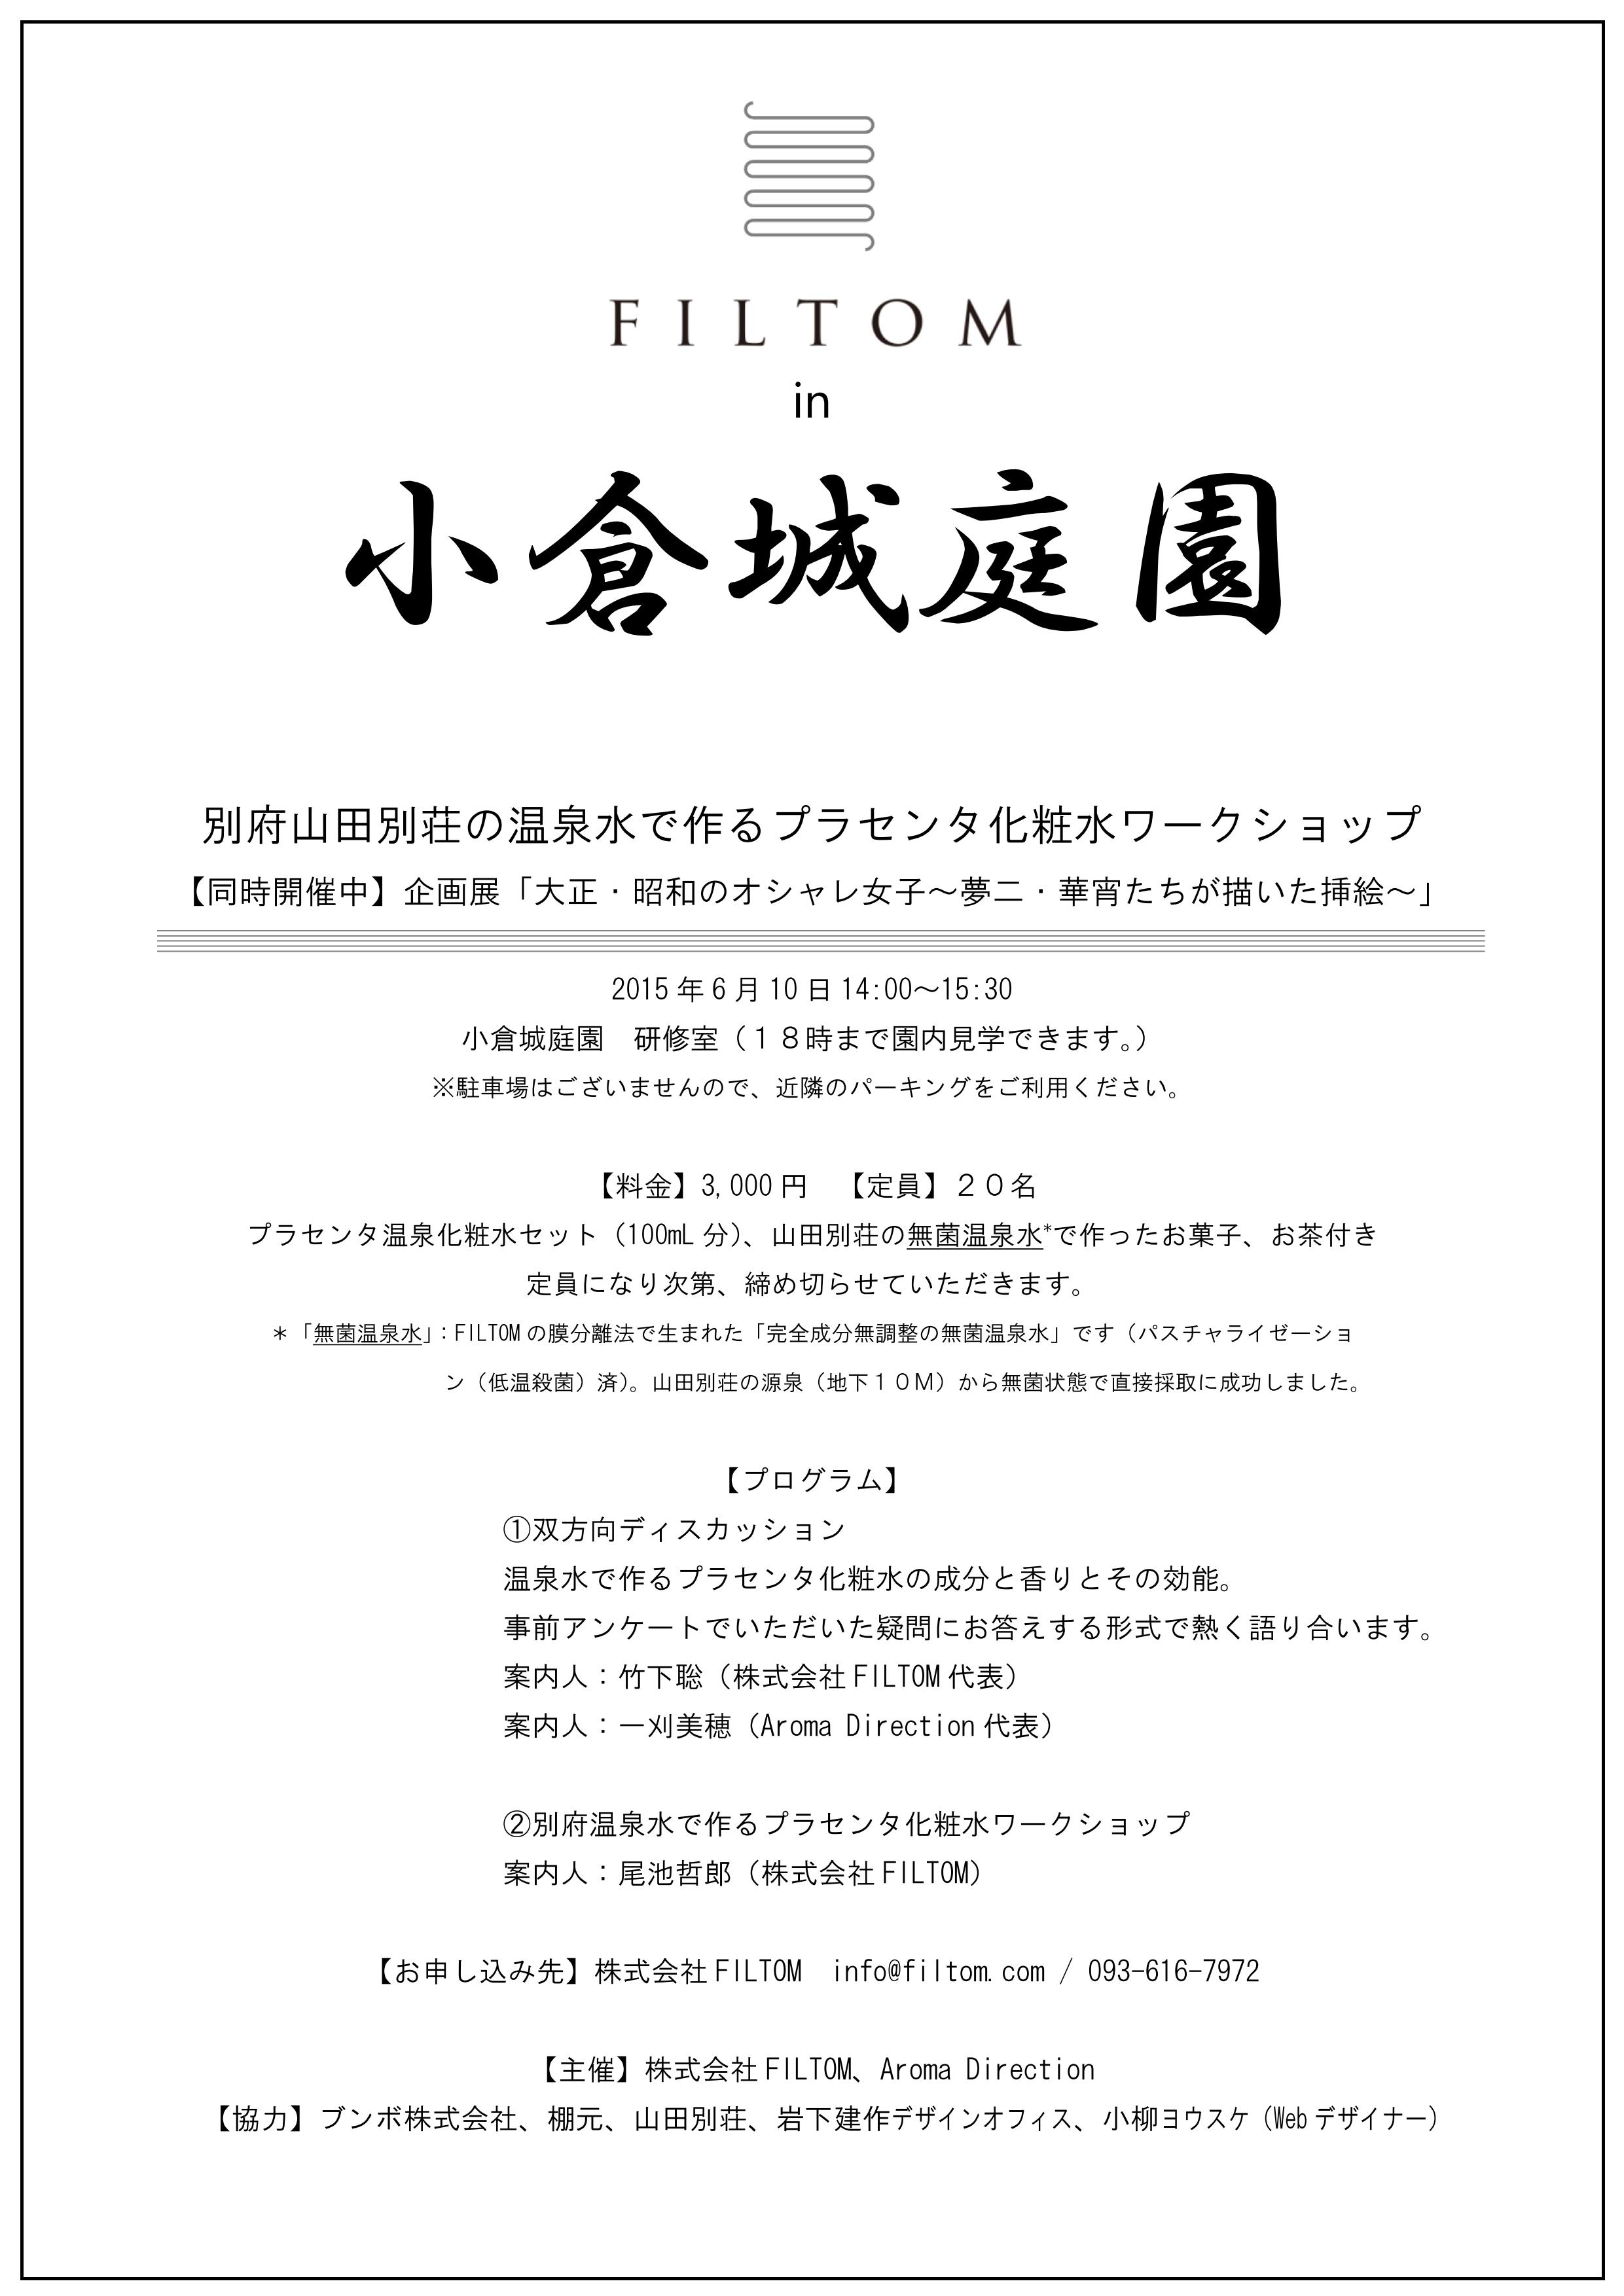 kokura_event_flyer